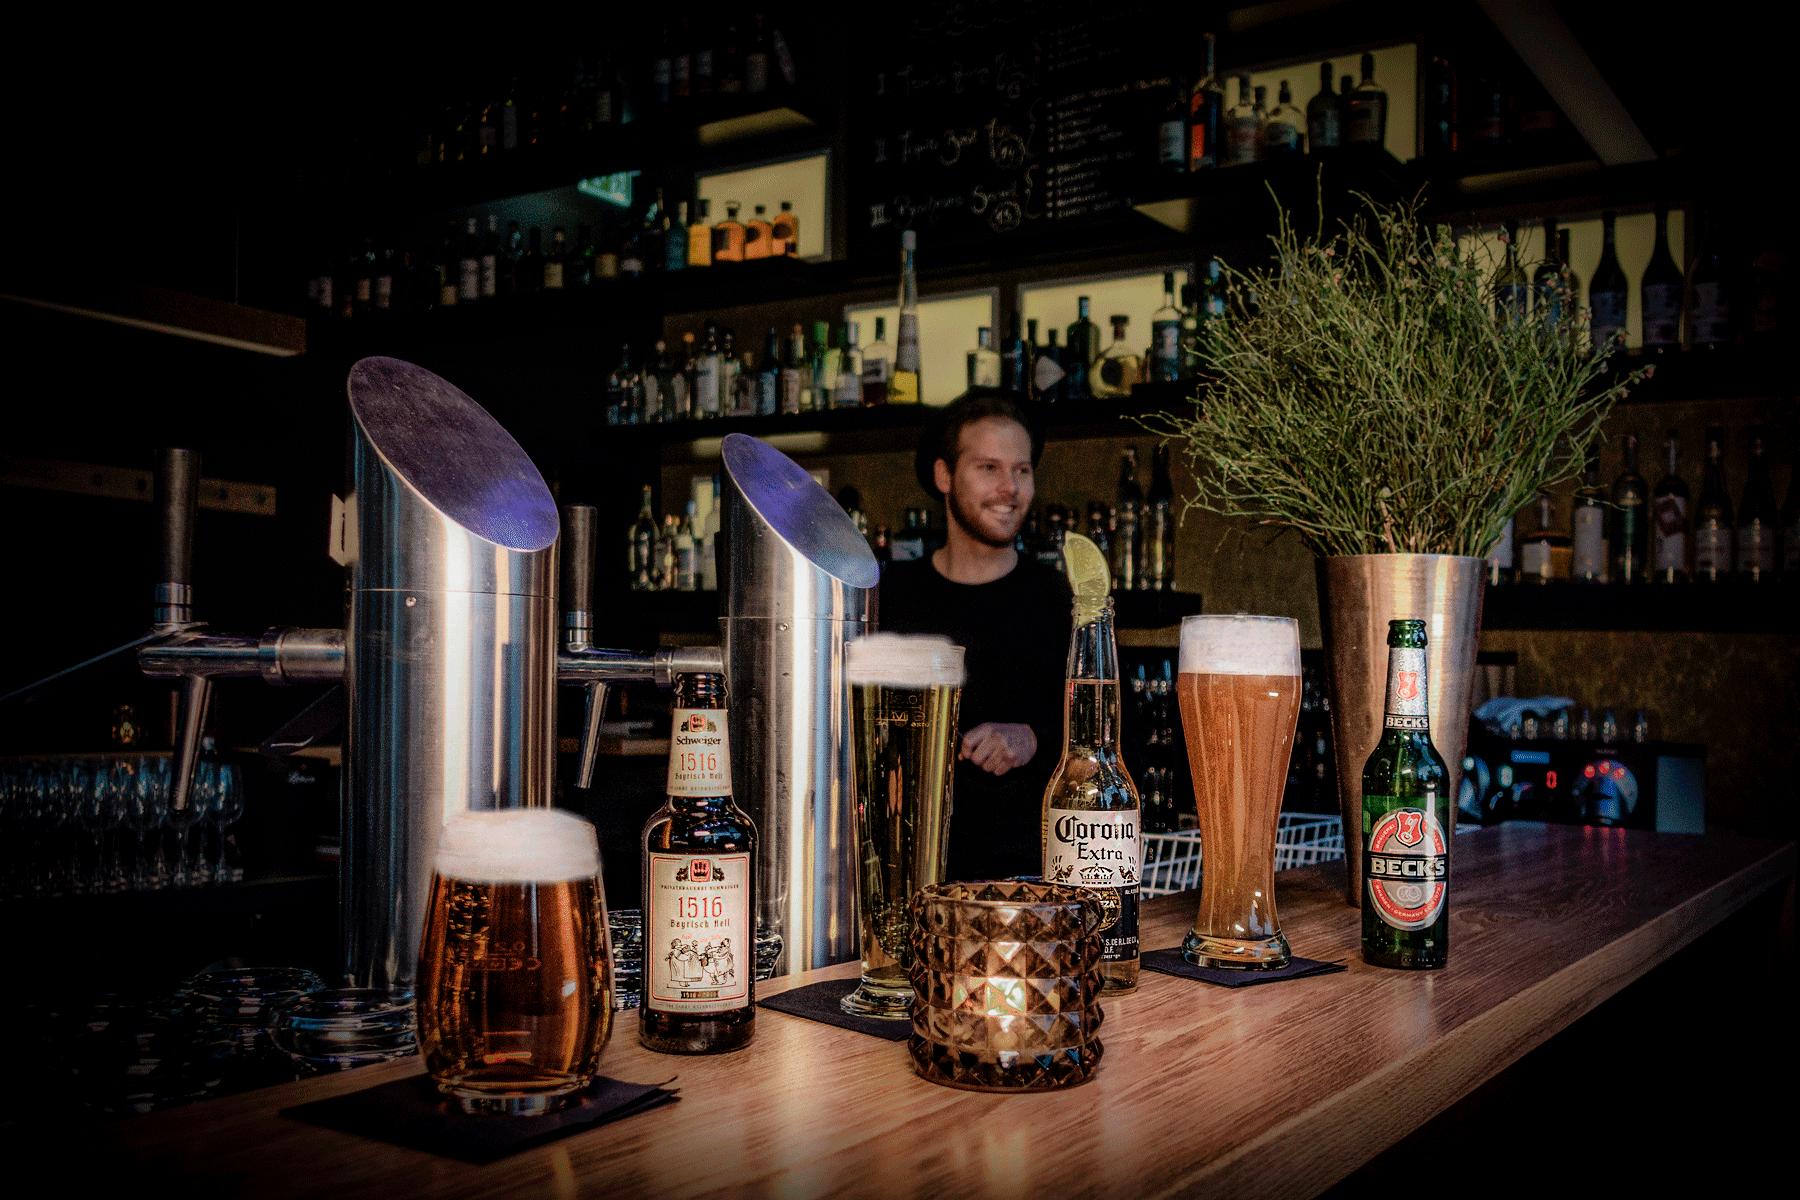 COPPER BAR & RESTAURANT FRANKFURT - Your Business After Hourh